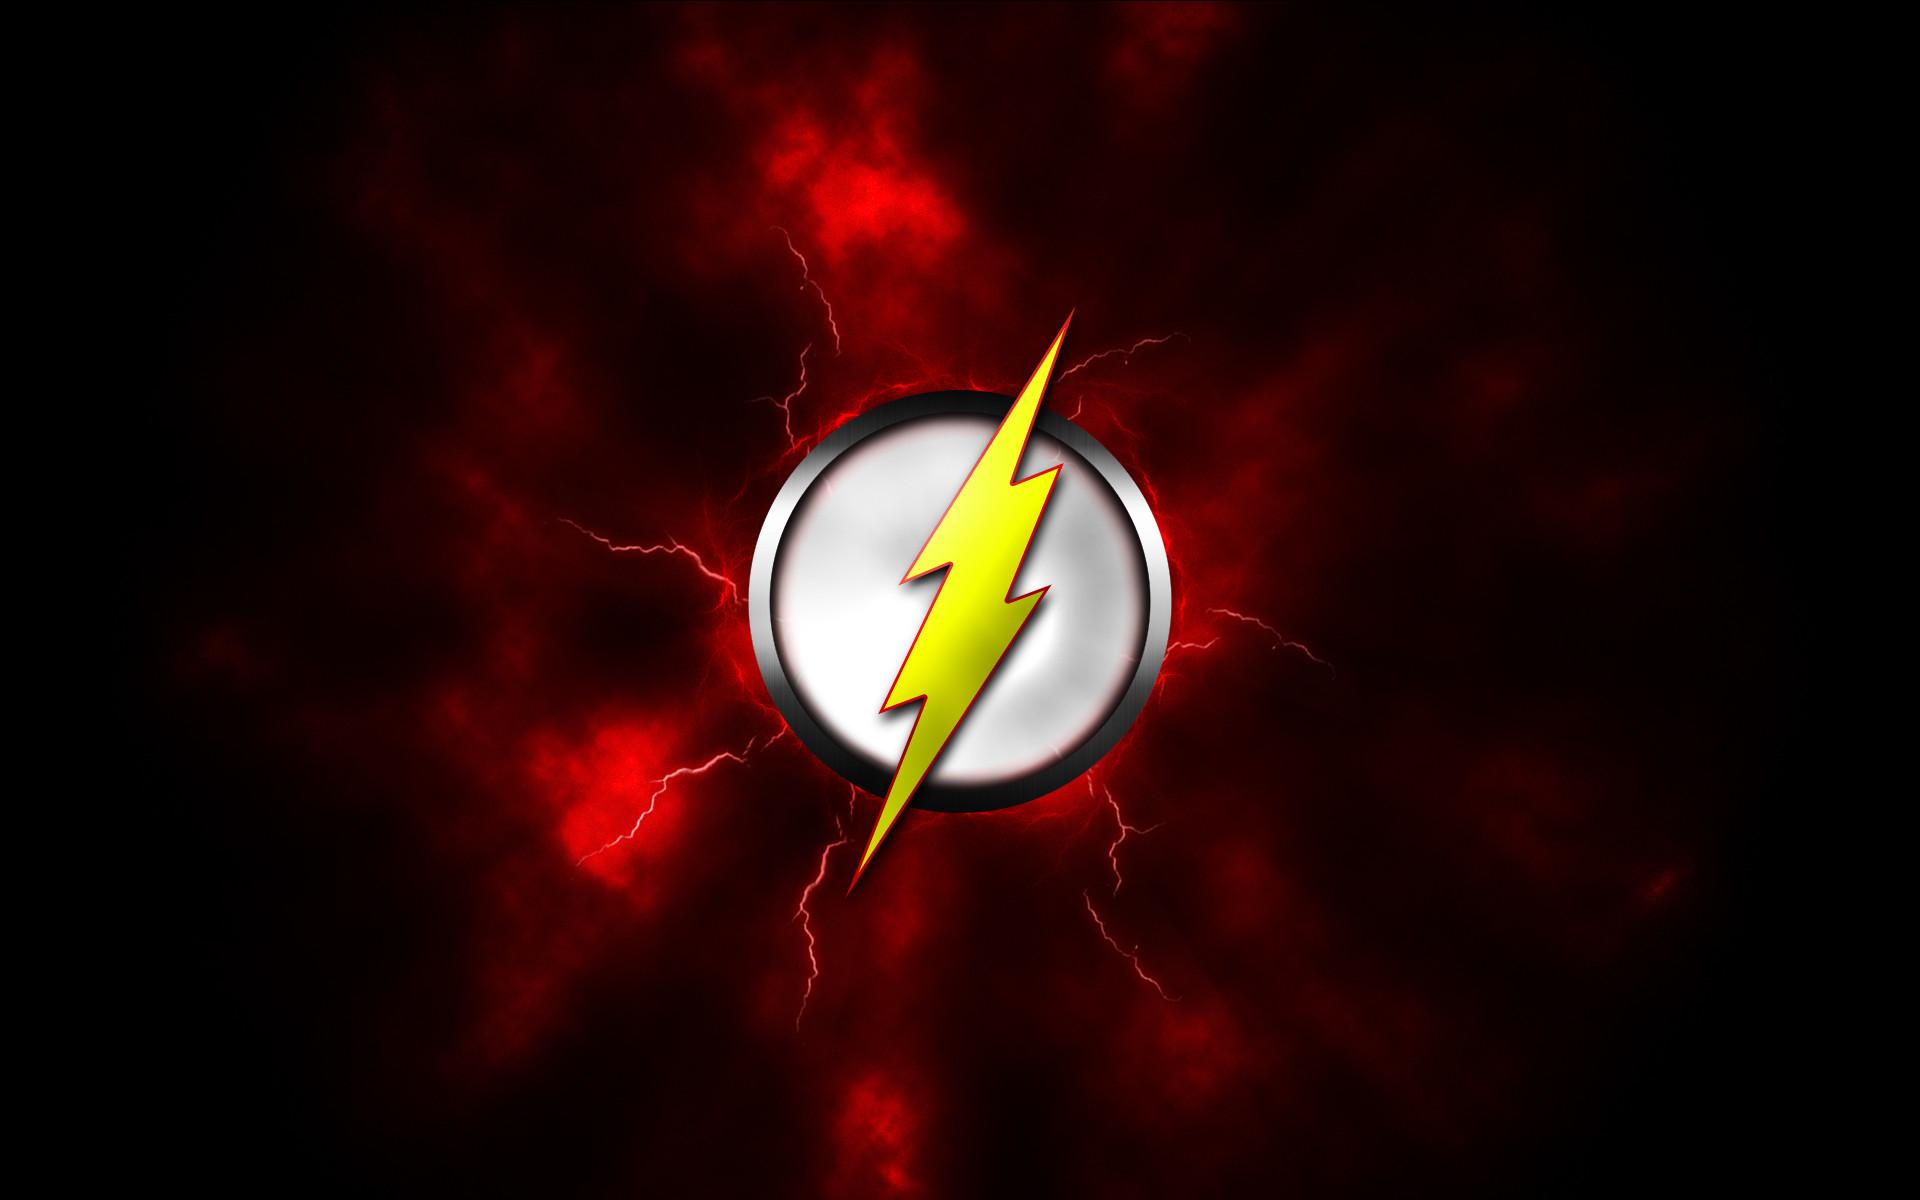 The Flash wallpaper